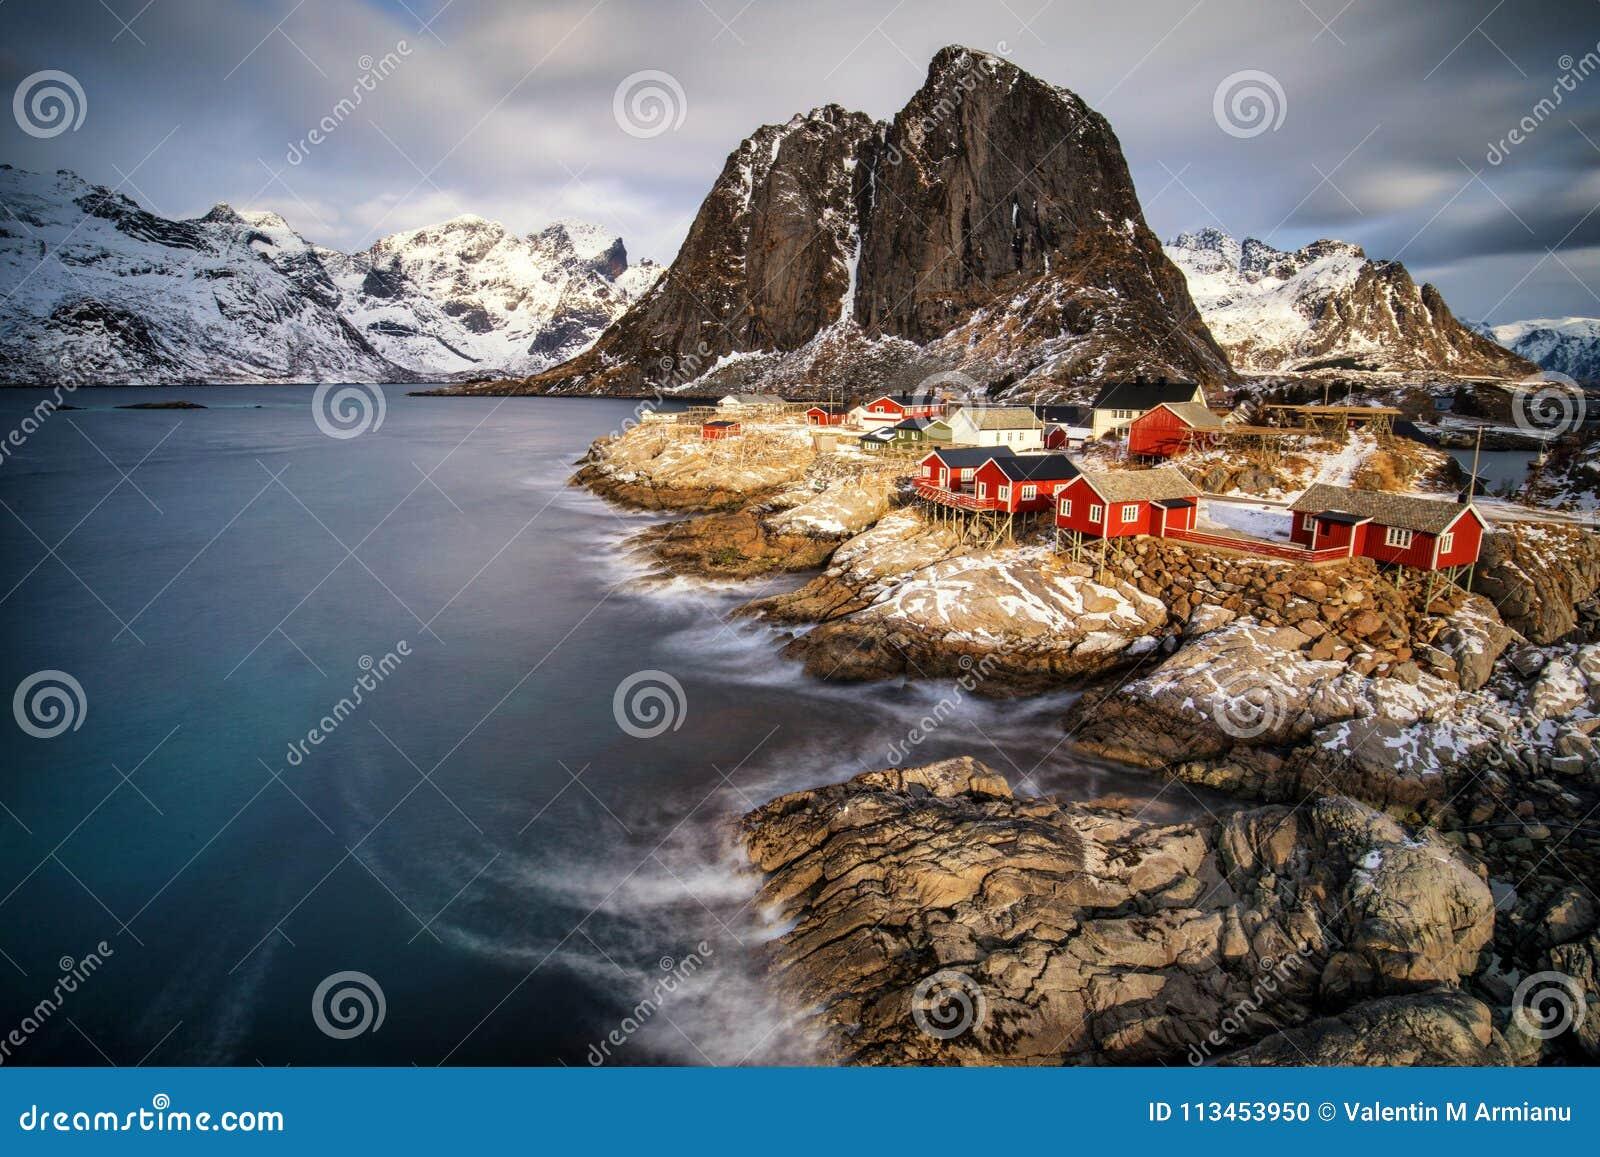 Fishing Hut Village in Hamnoy, Norway